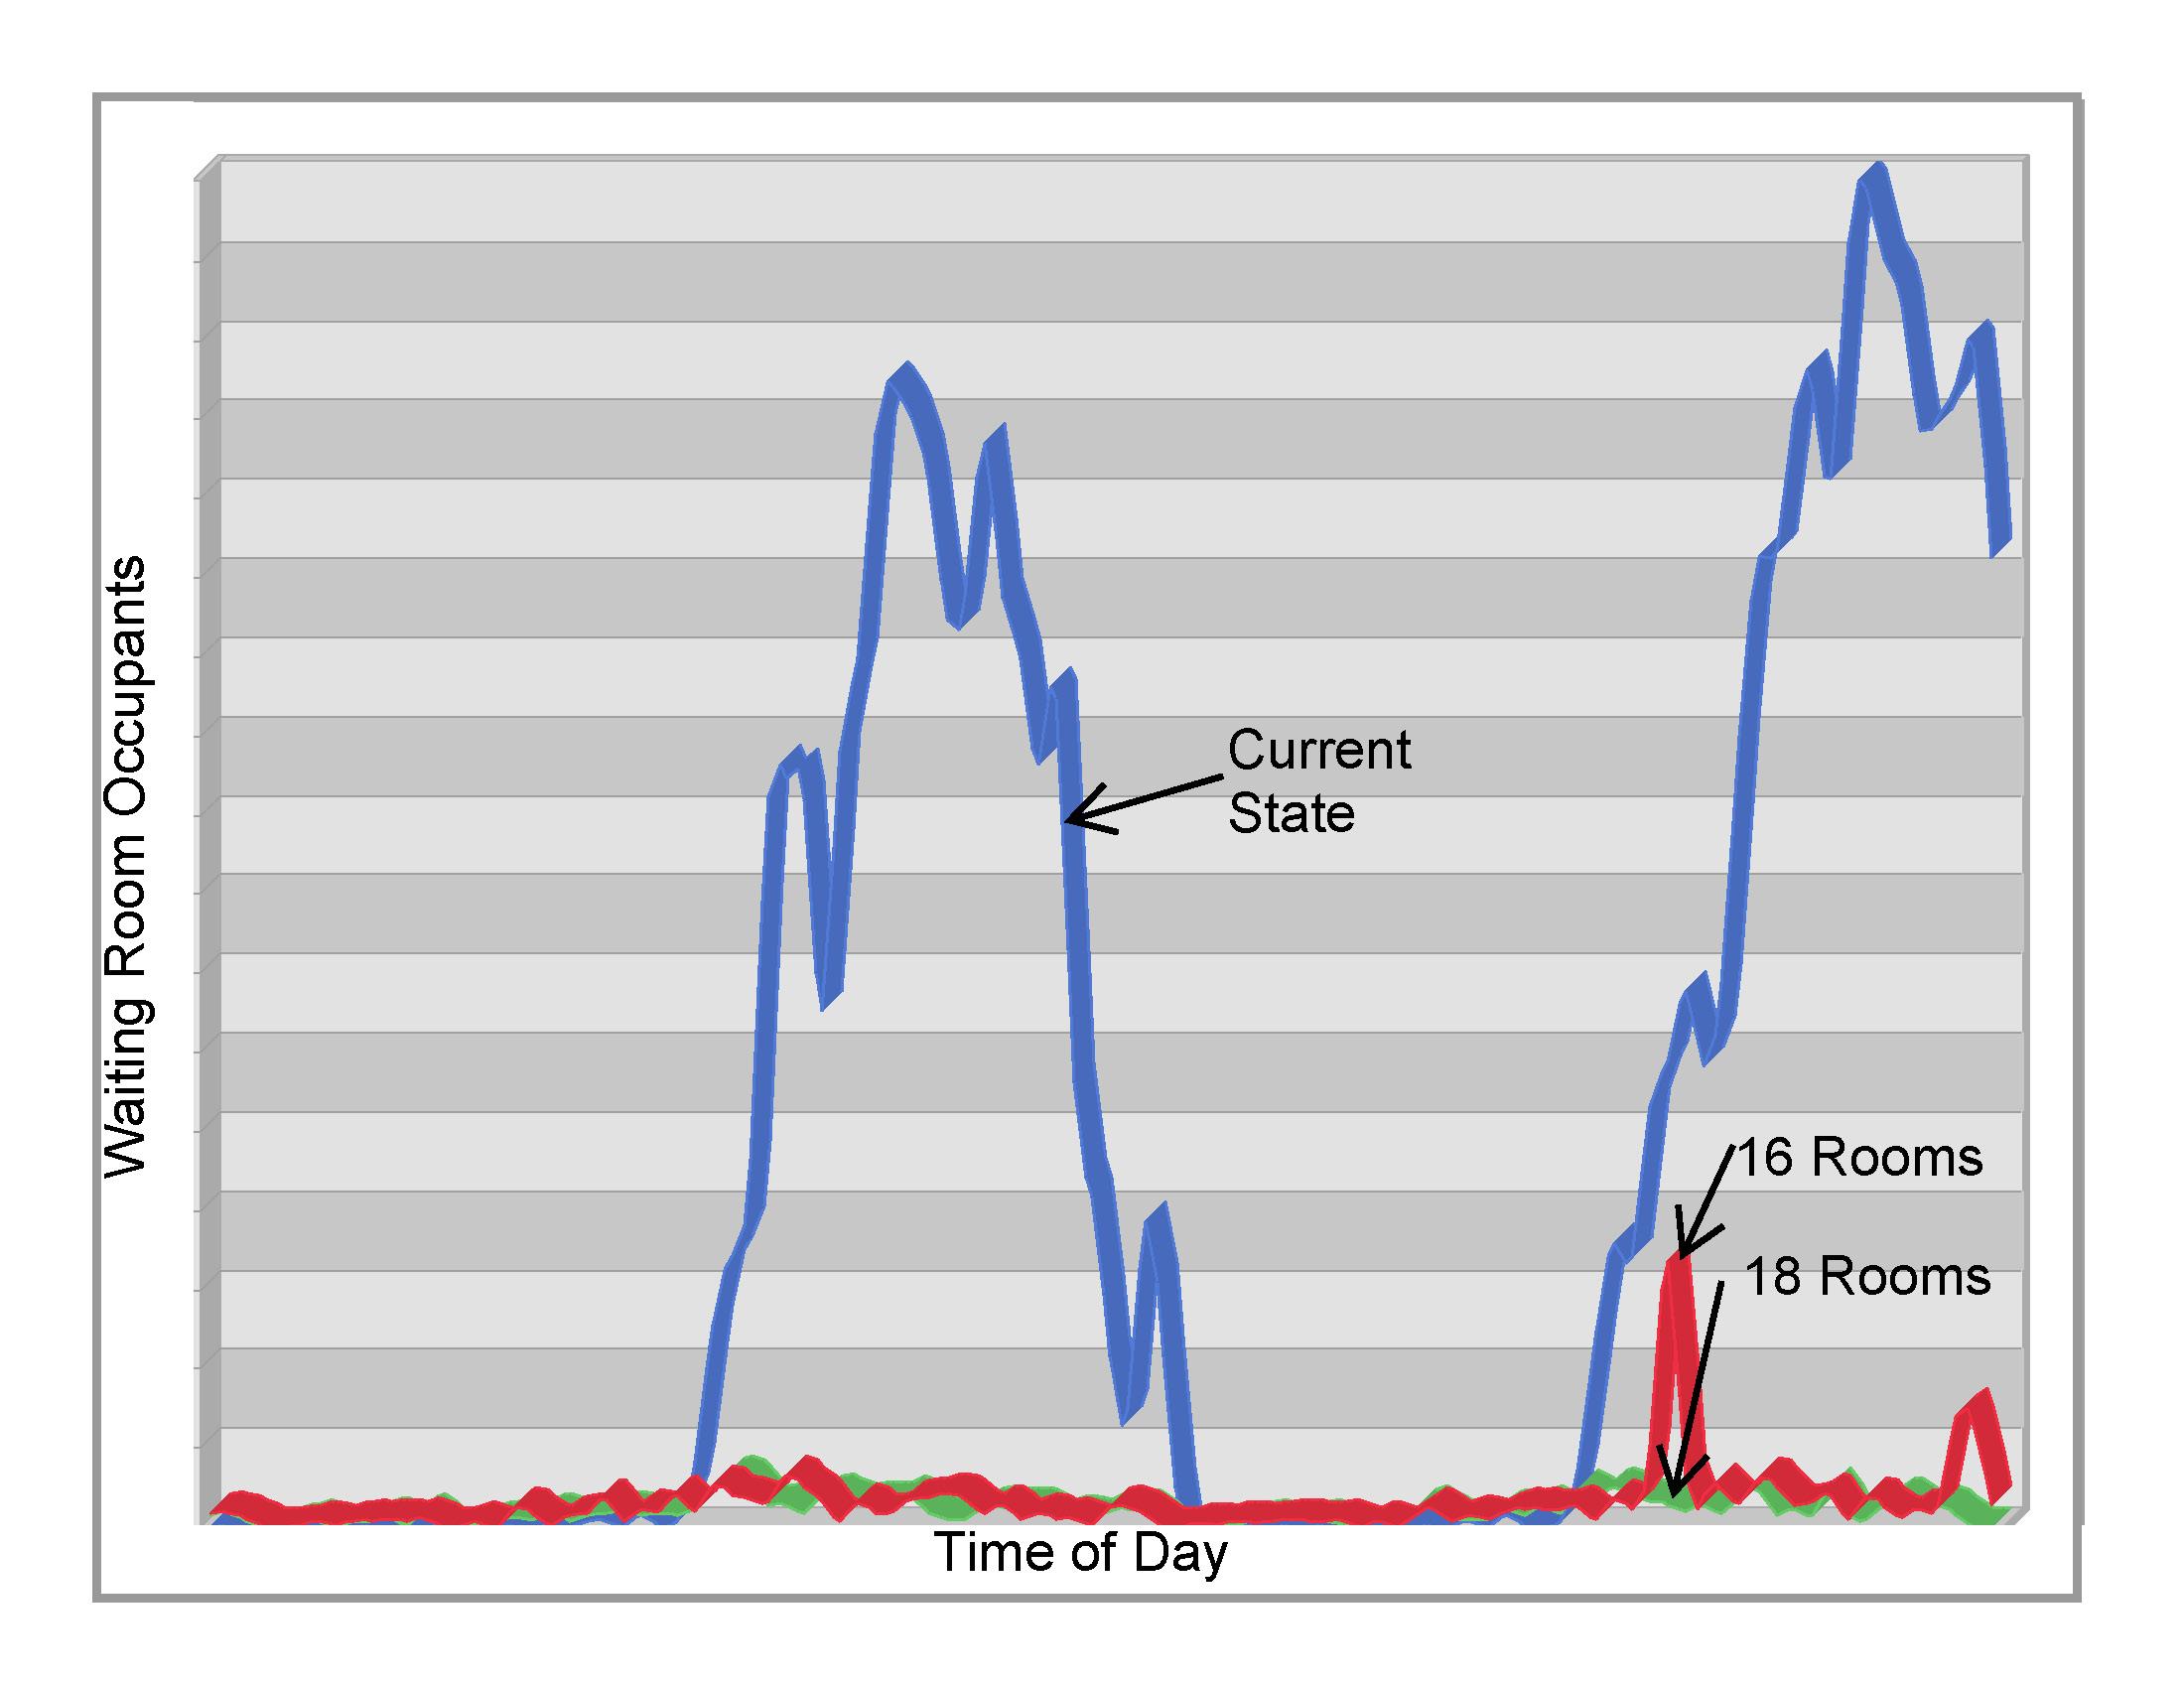 Room count scenario comparison over 2 peak day